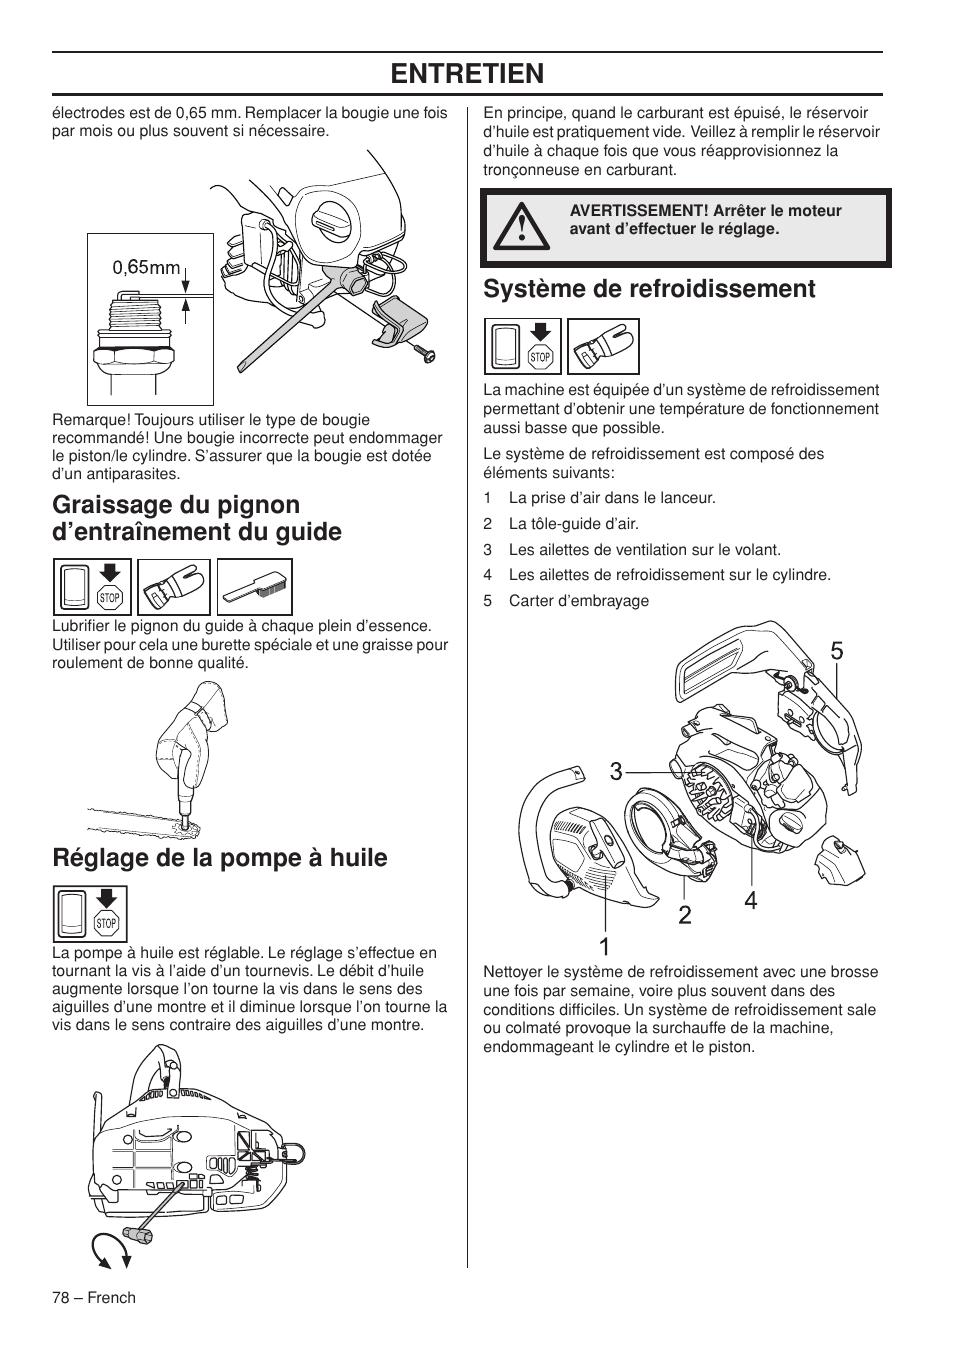 Sump Plug VW PASSAT 2.0 TDI B8 Moteur Service Kit Huile//air//carburant//Cabine Filtre